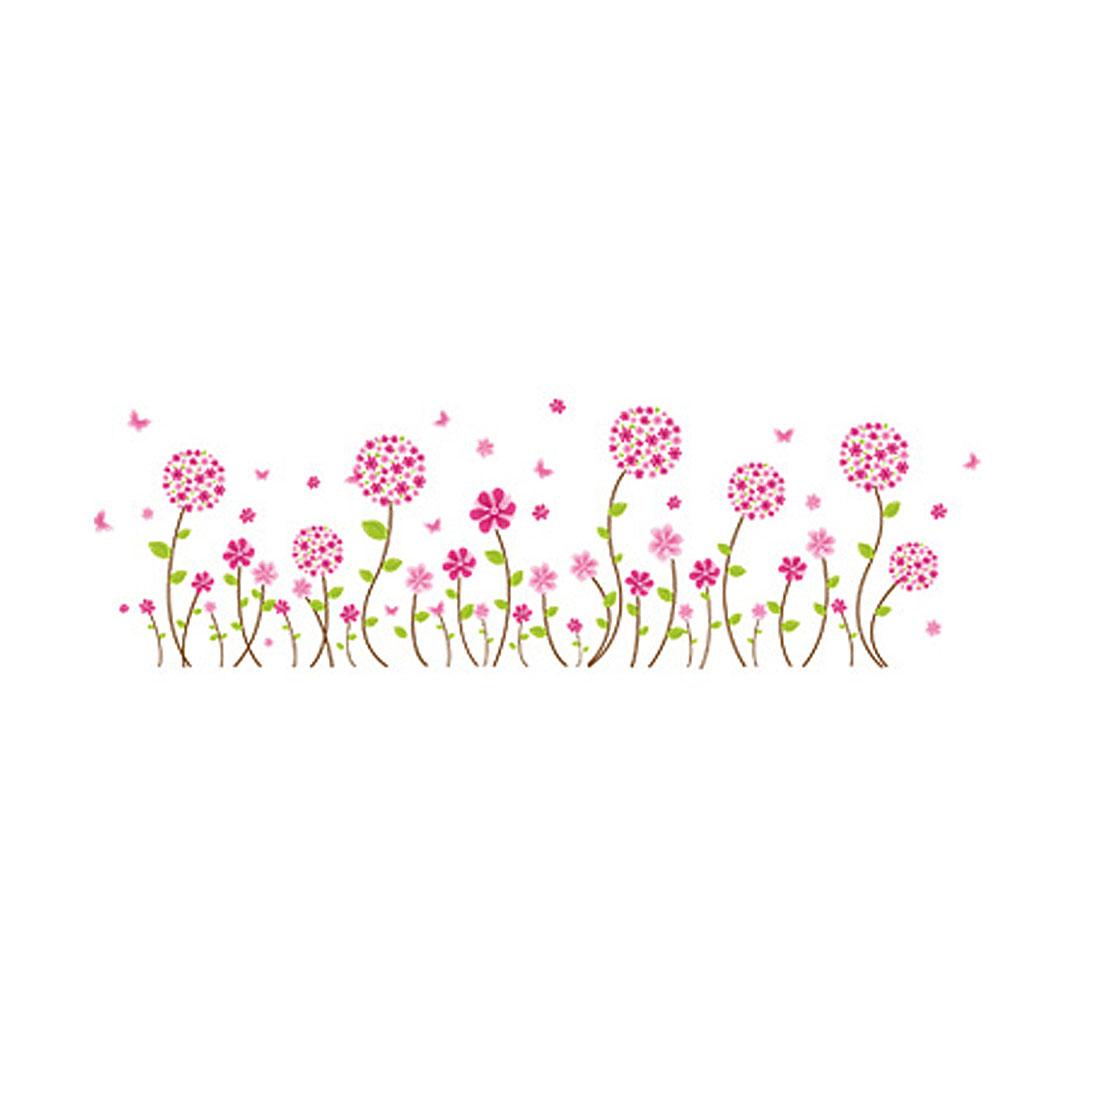 Pink Purple Dandelion Flower Wall Sticker Mural Room Decor - image 4 of 4